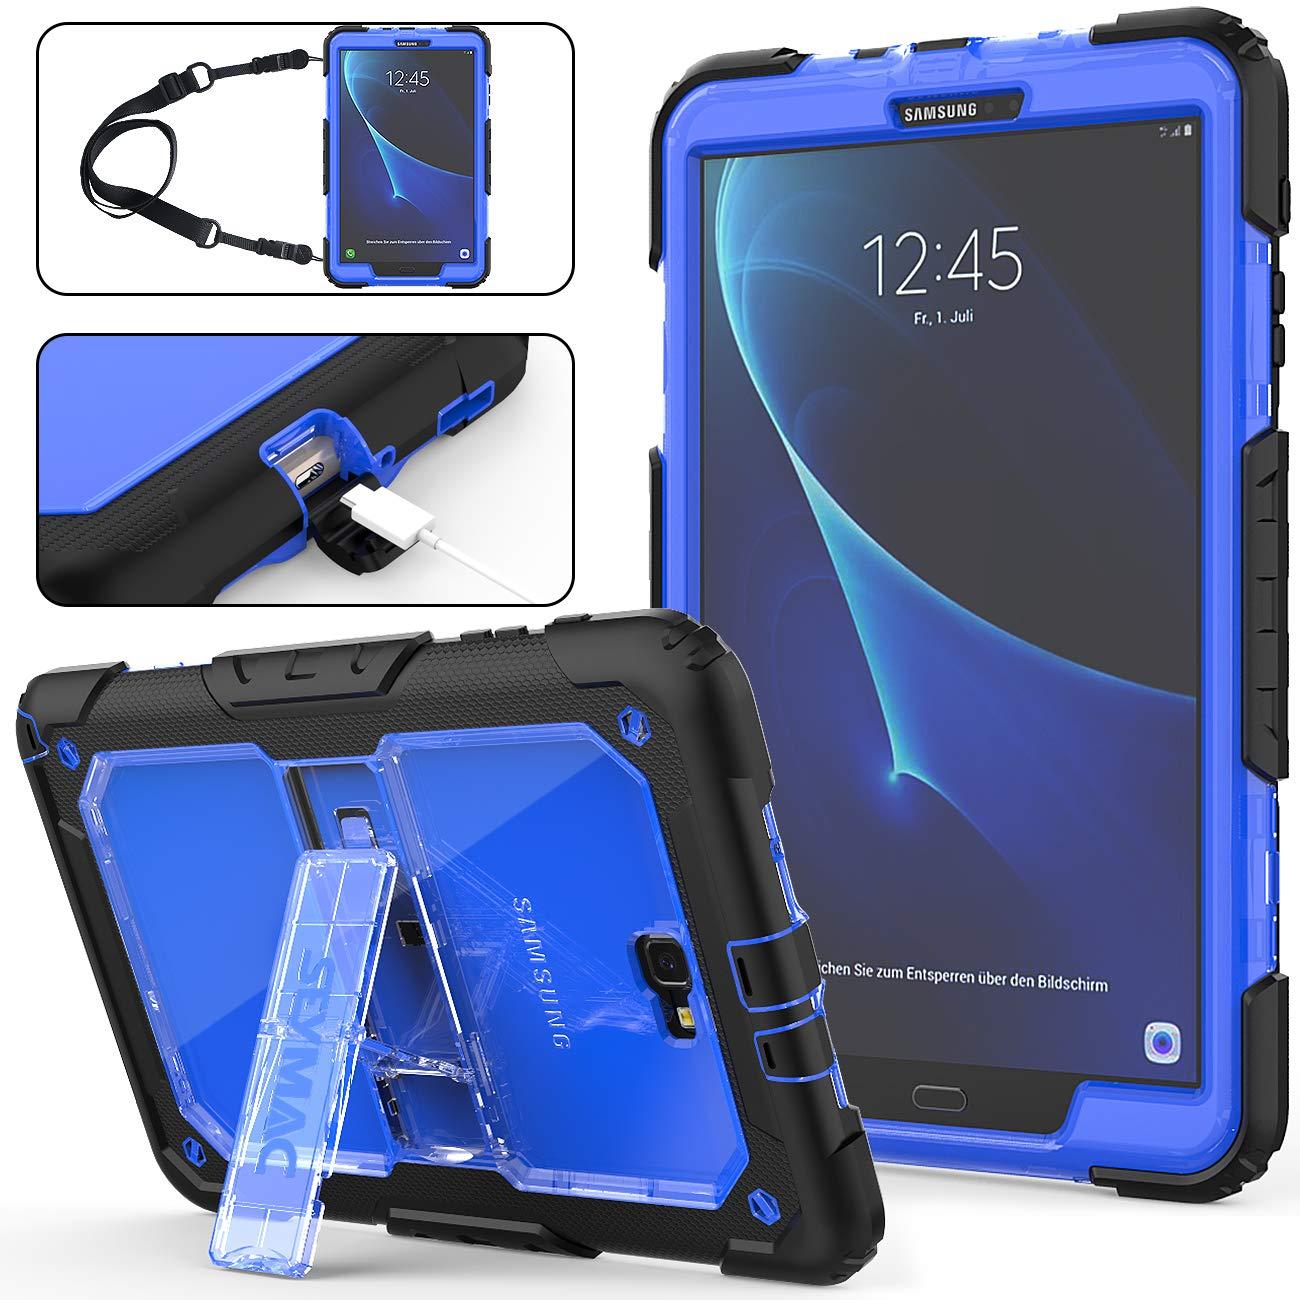 Funda Para Galaxy Tab A 10.1 T580/t585/t587 Con Corre (7TS2)